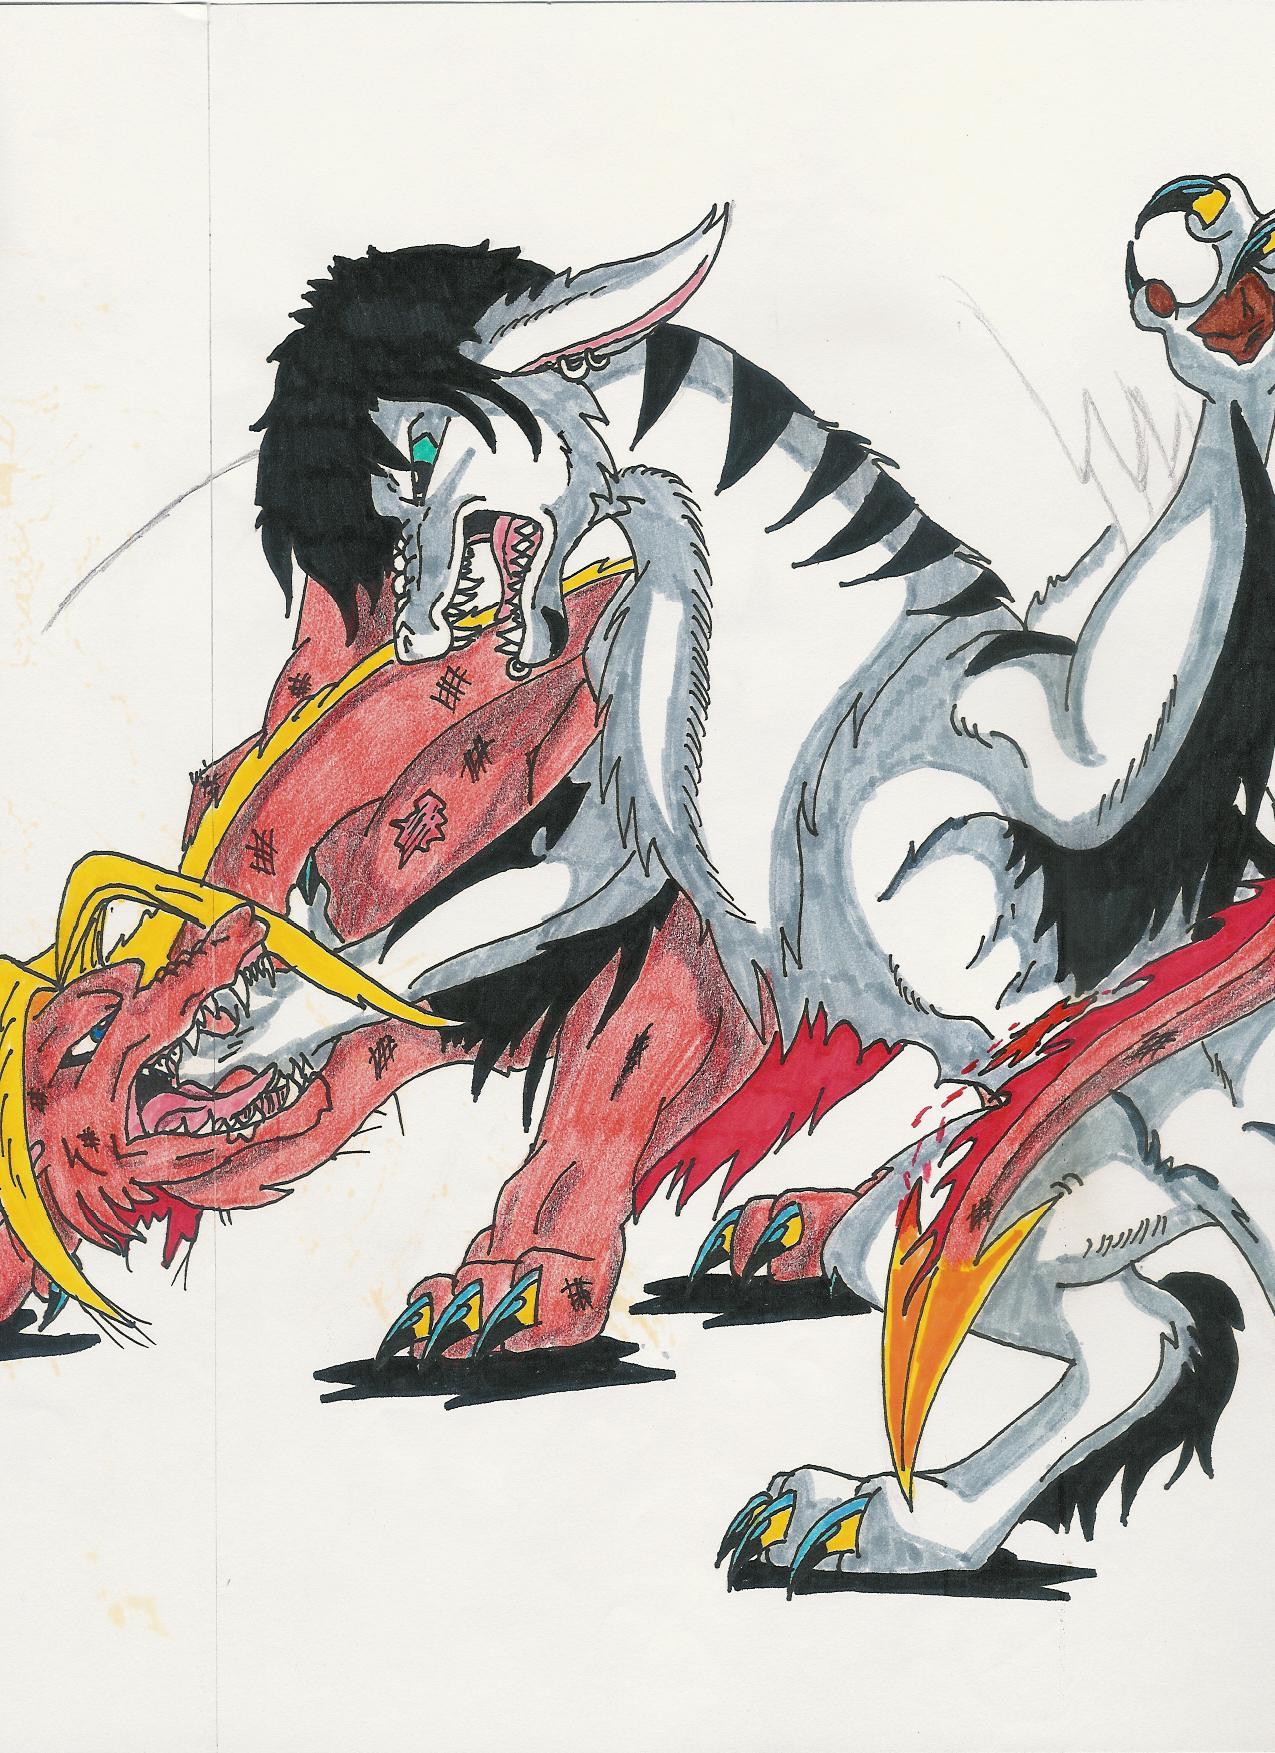 fight-dragons2 by dracula-vs-werewolf on DeviantArt